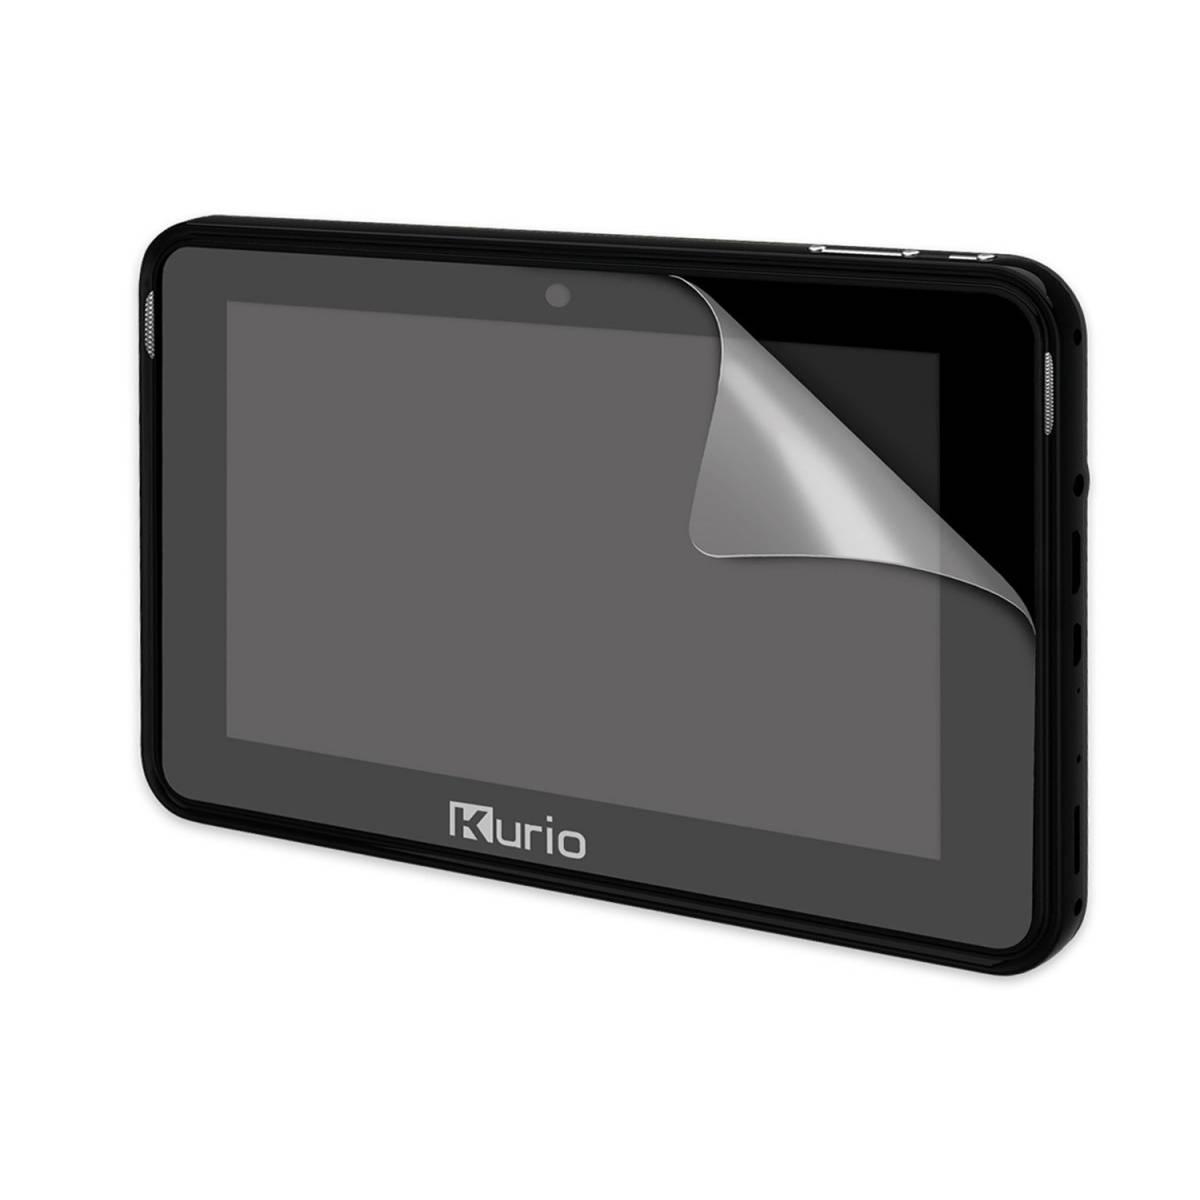 Kurio - Protection Transparente pour Tablette 7`` Kurio